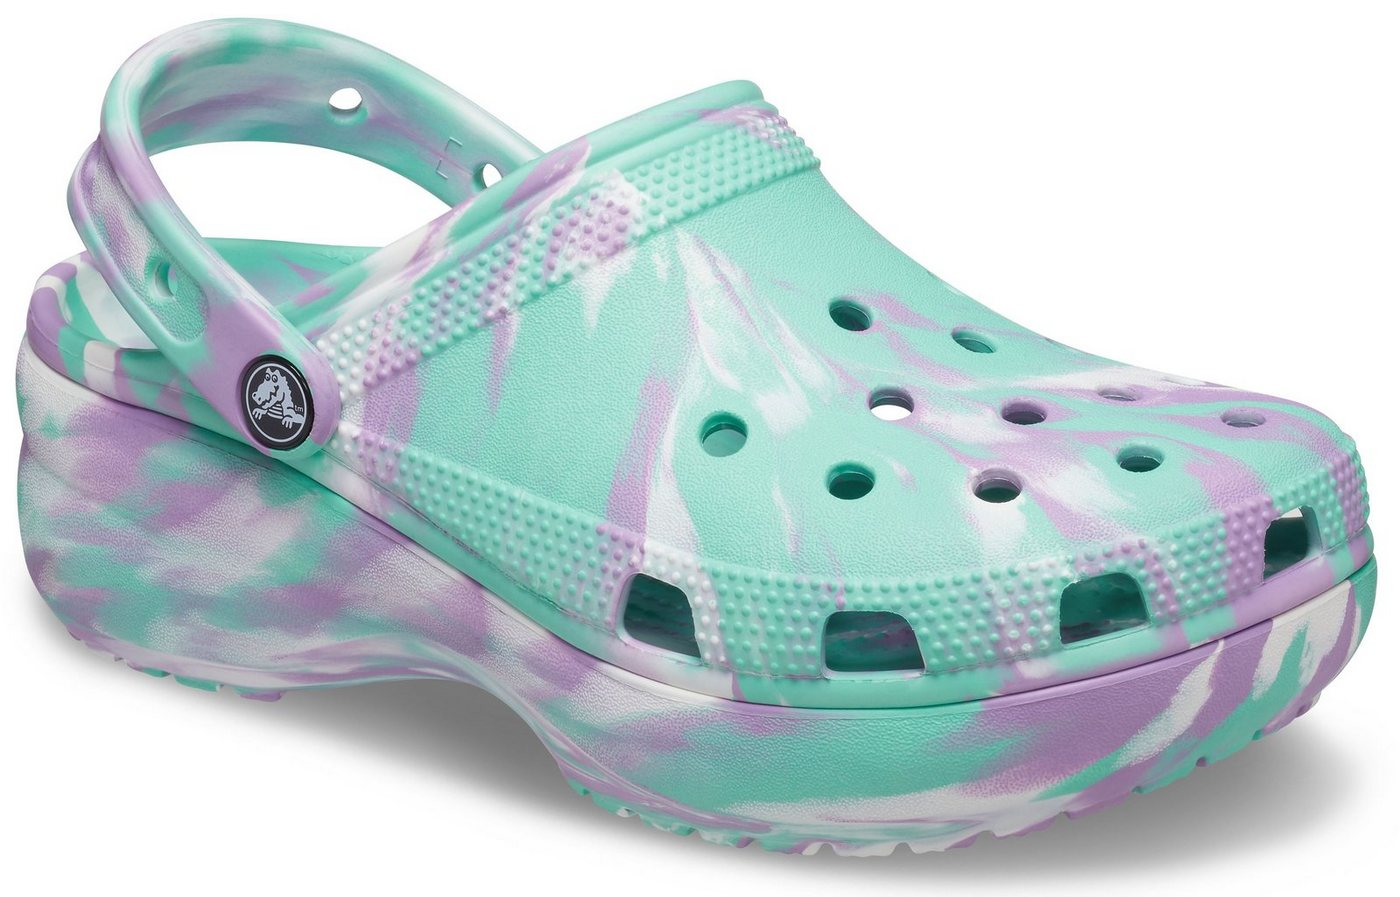 Clogs - Crocs »Classic Platform Marbled Clog« Clog mit pastellfarbenem Batikmuster › grün  - Onlineshop OTTO